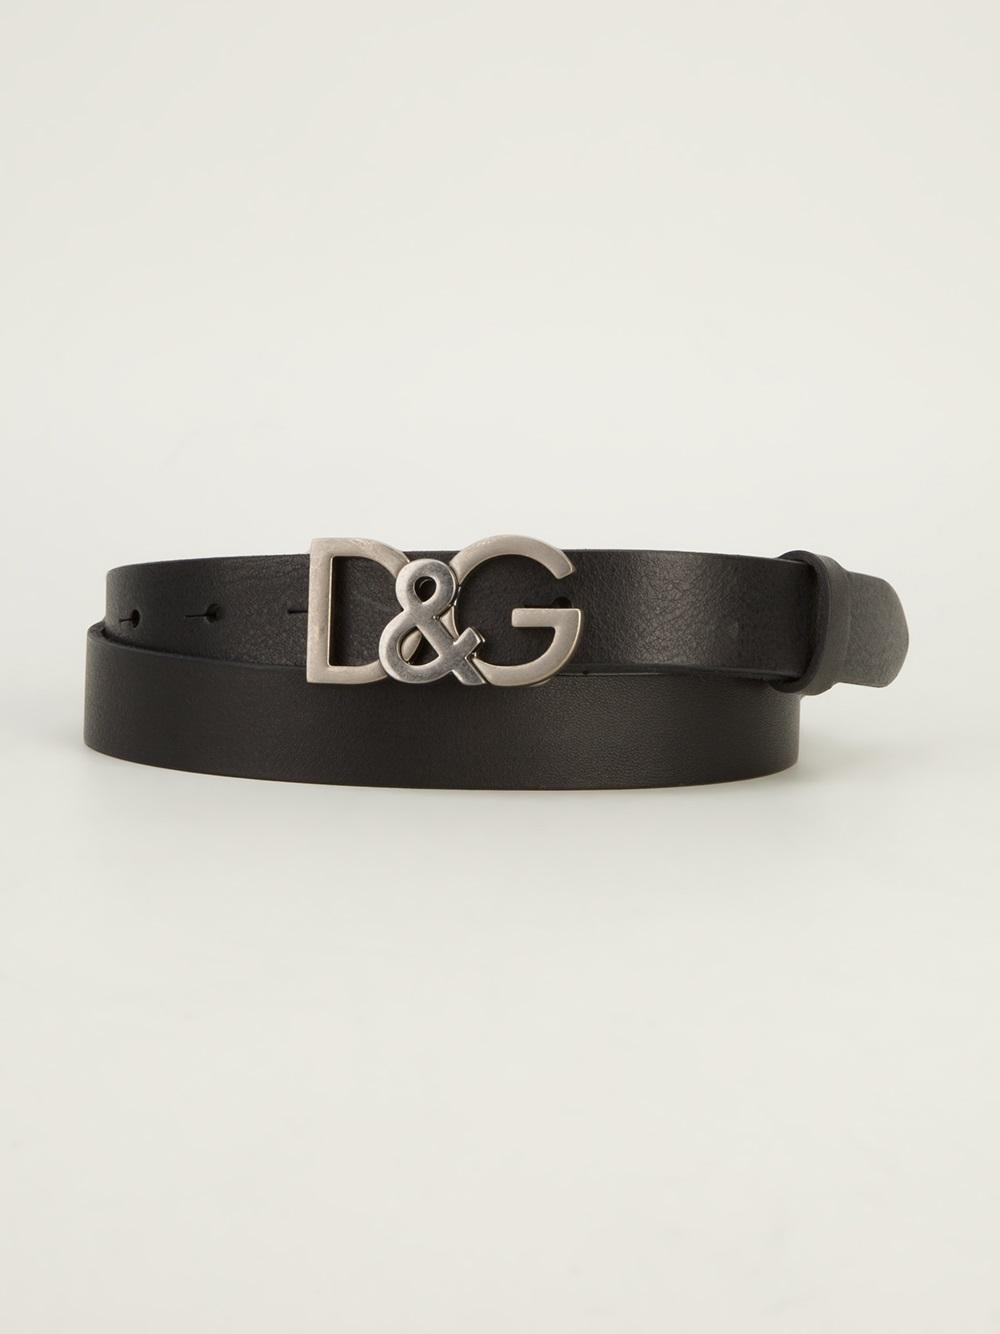 d147422e08 ... wholesale lyst dolce gabbana logo belt in black for men ee691 7acdb